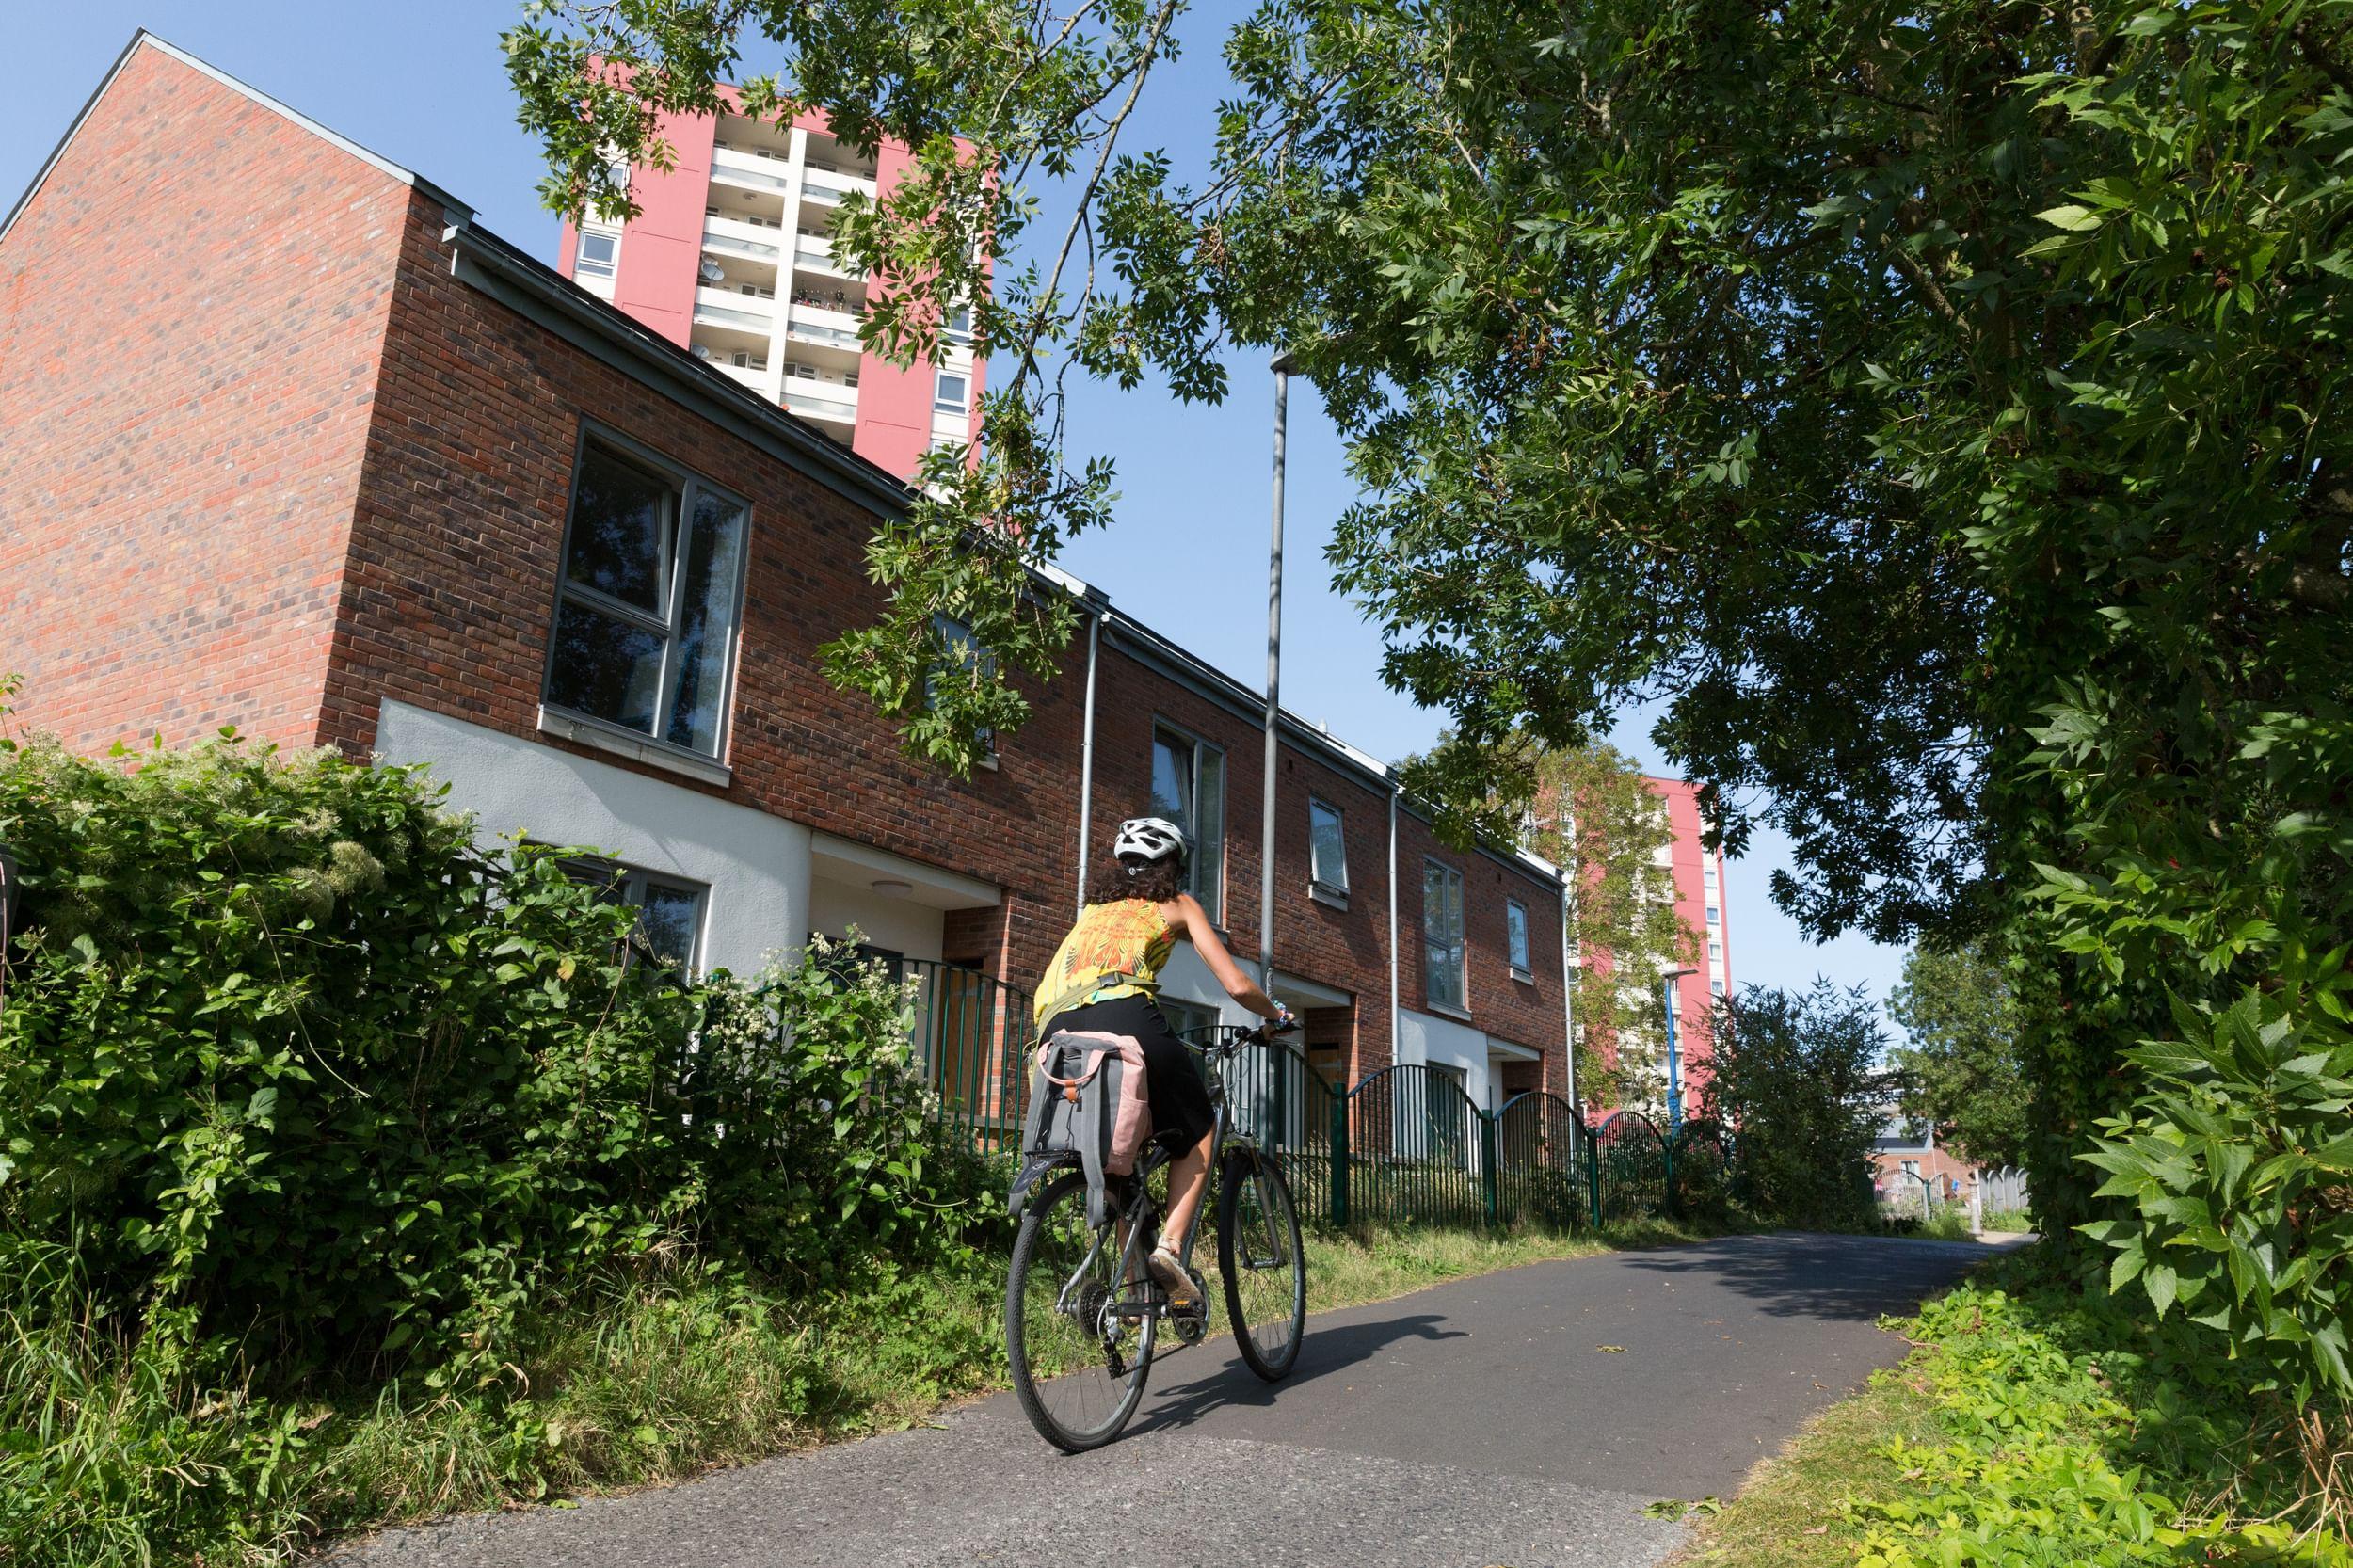 Cyclist in an urban area